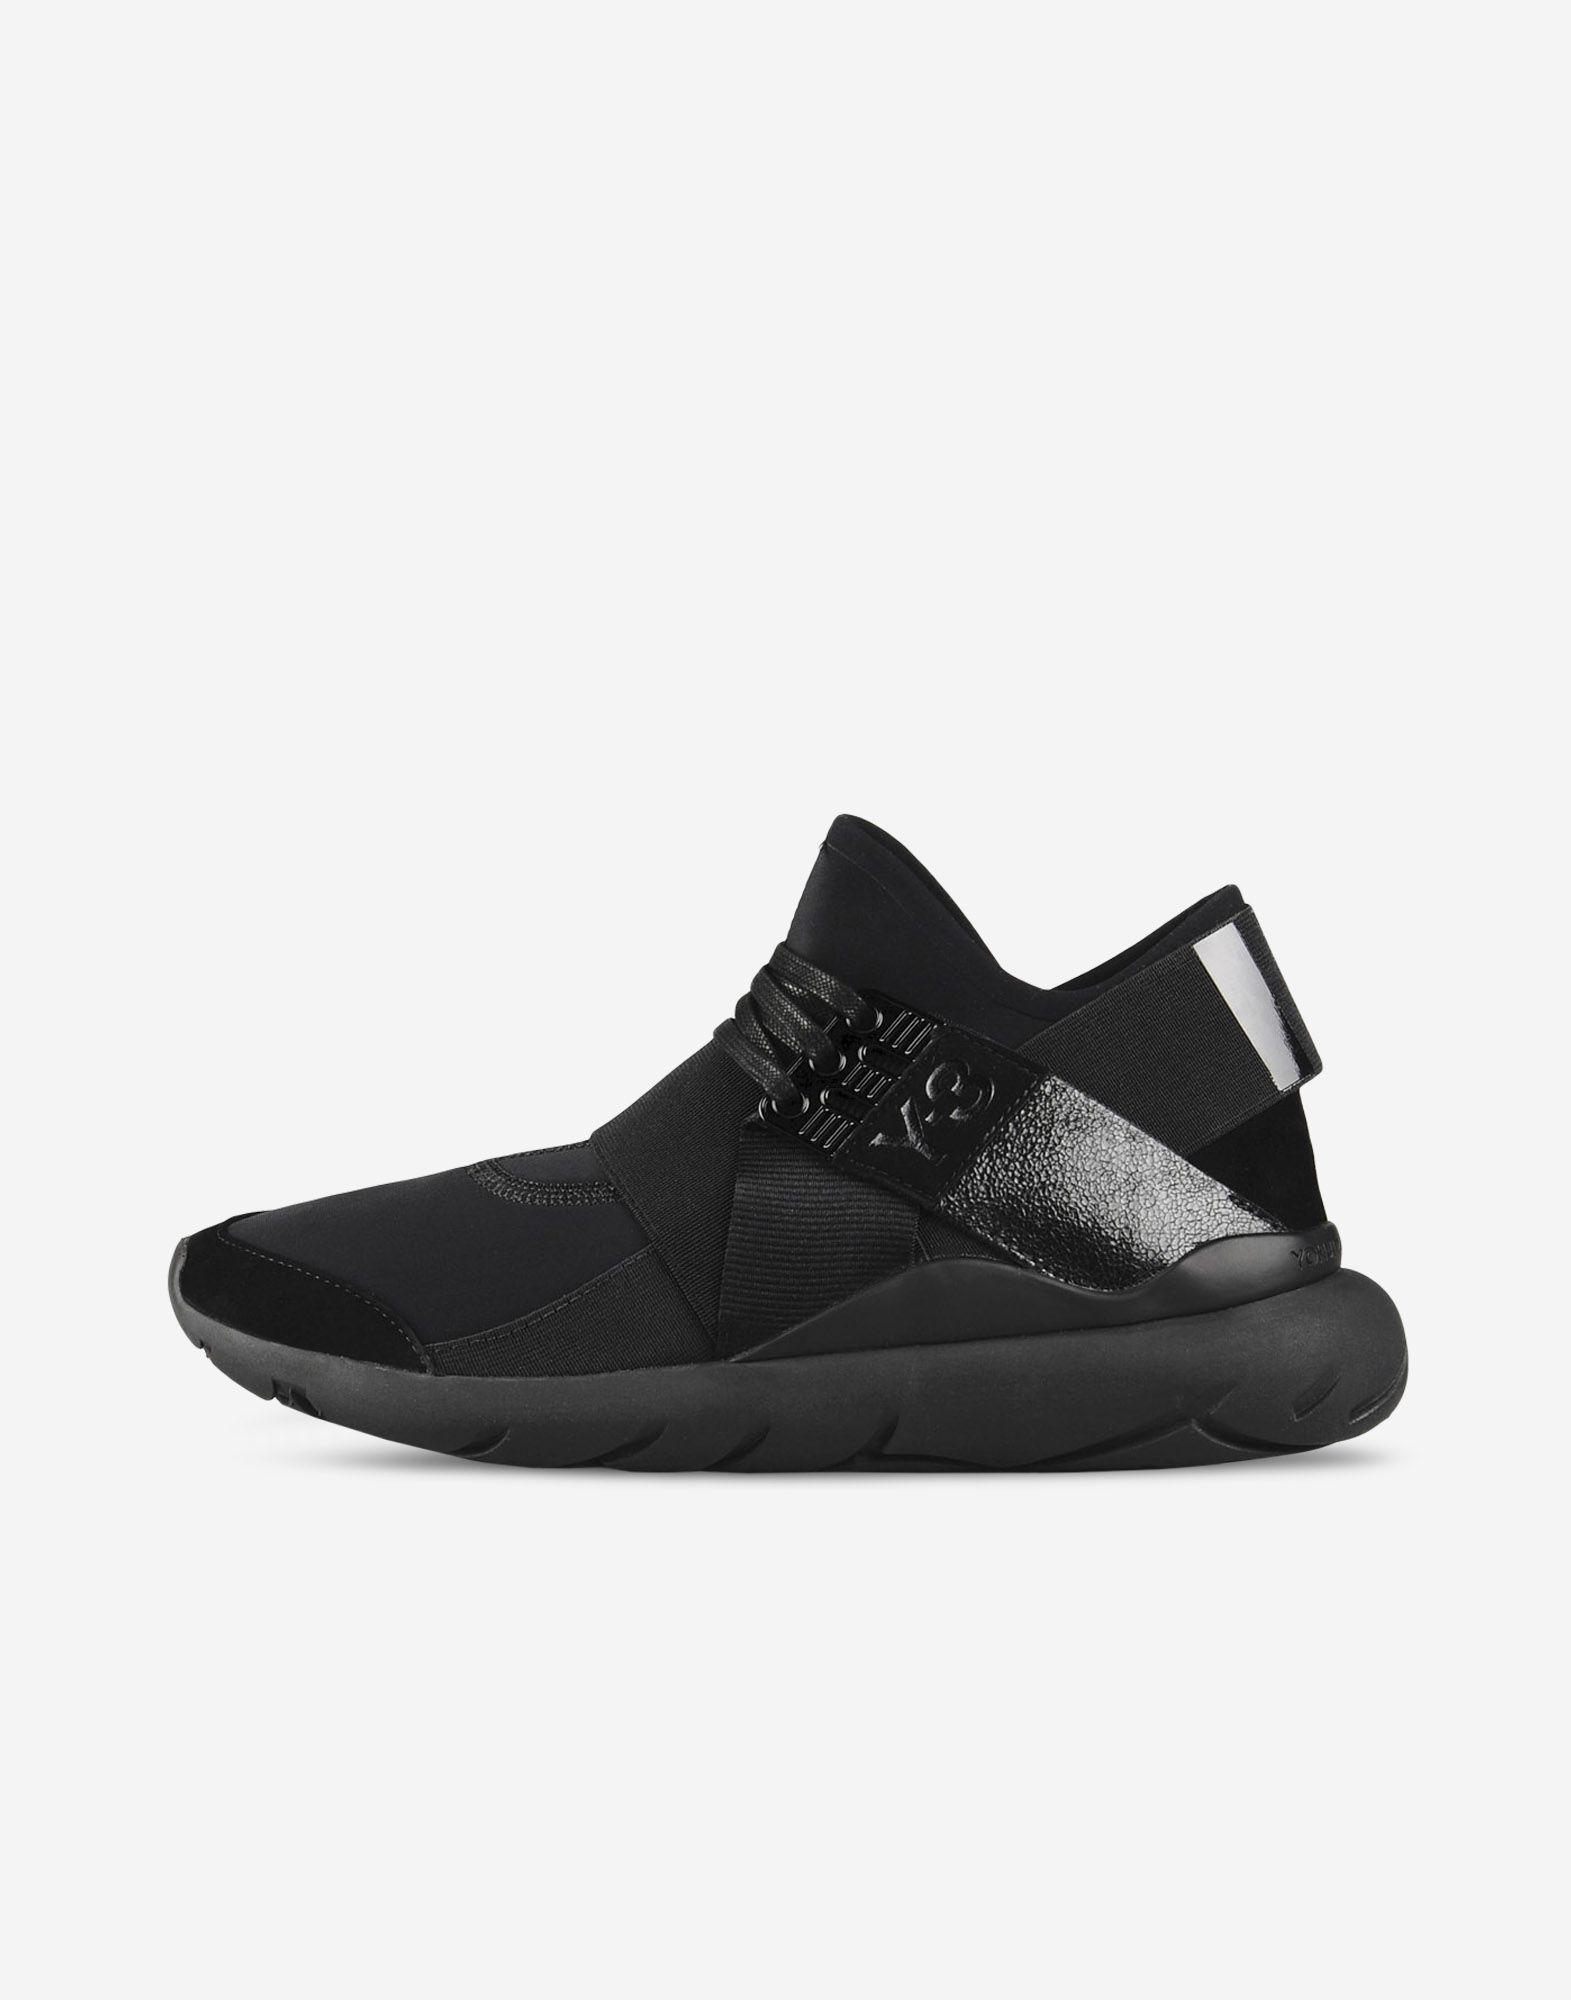 581e873790fa8 ... Y-3 Y-3 QASA ELLE LACE Sneakers Woman ...